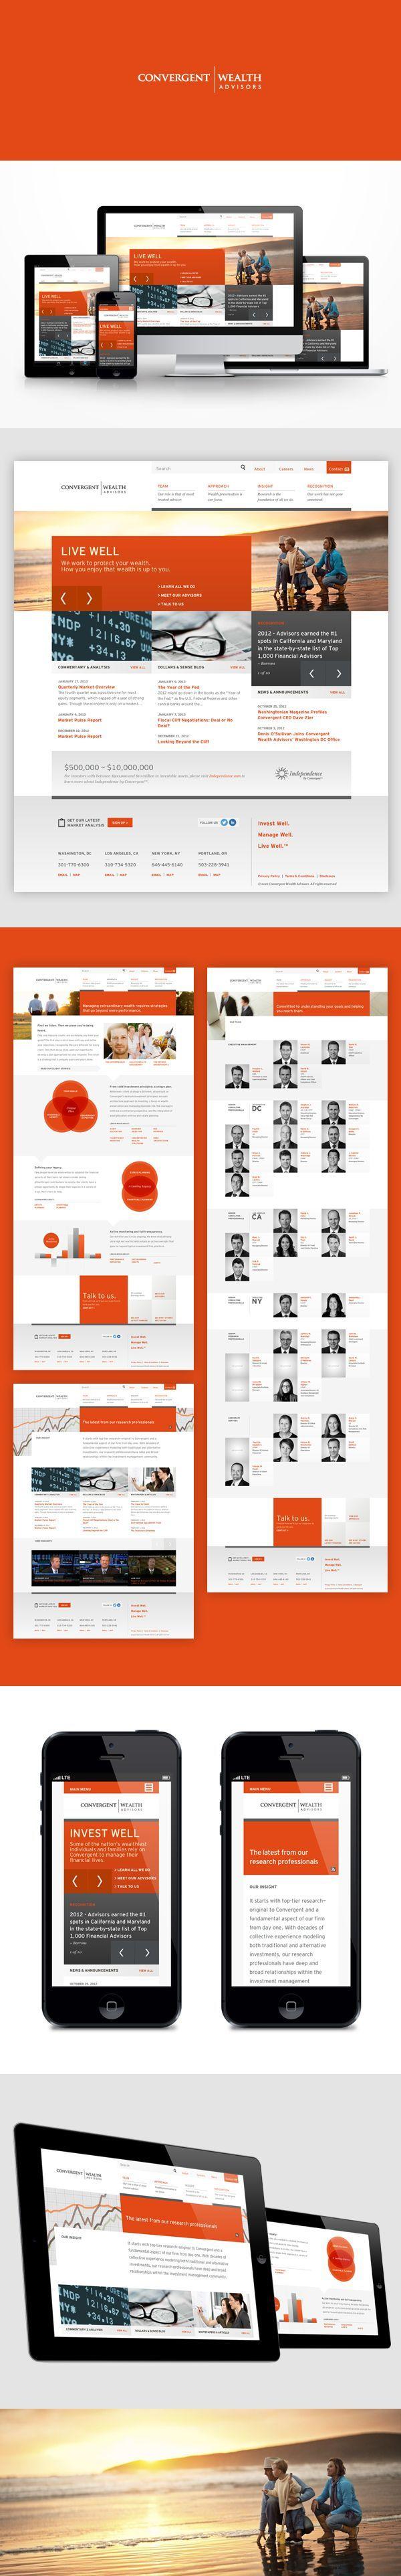 Convergent Wealth Advisors by Sun Yun, via Behance #webdesign: